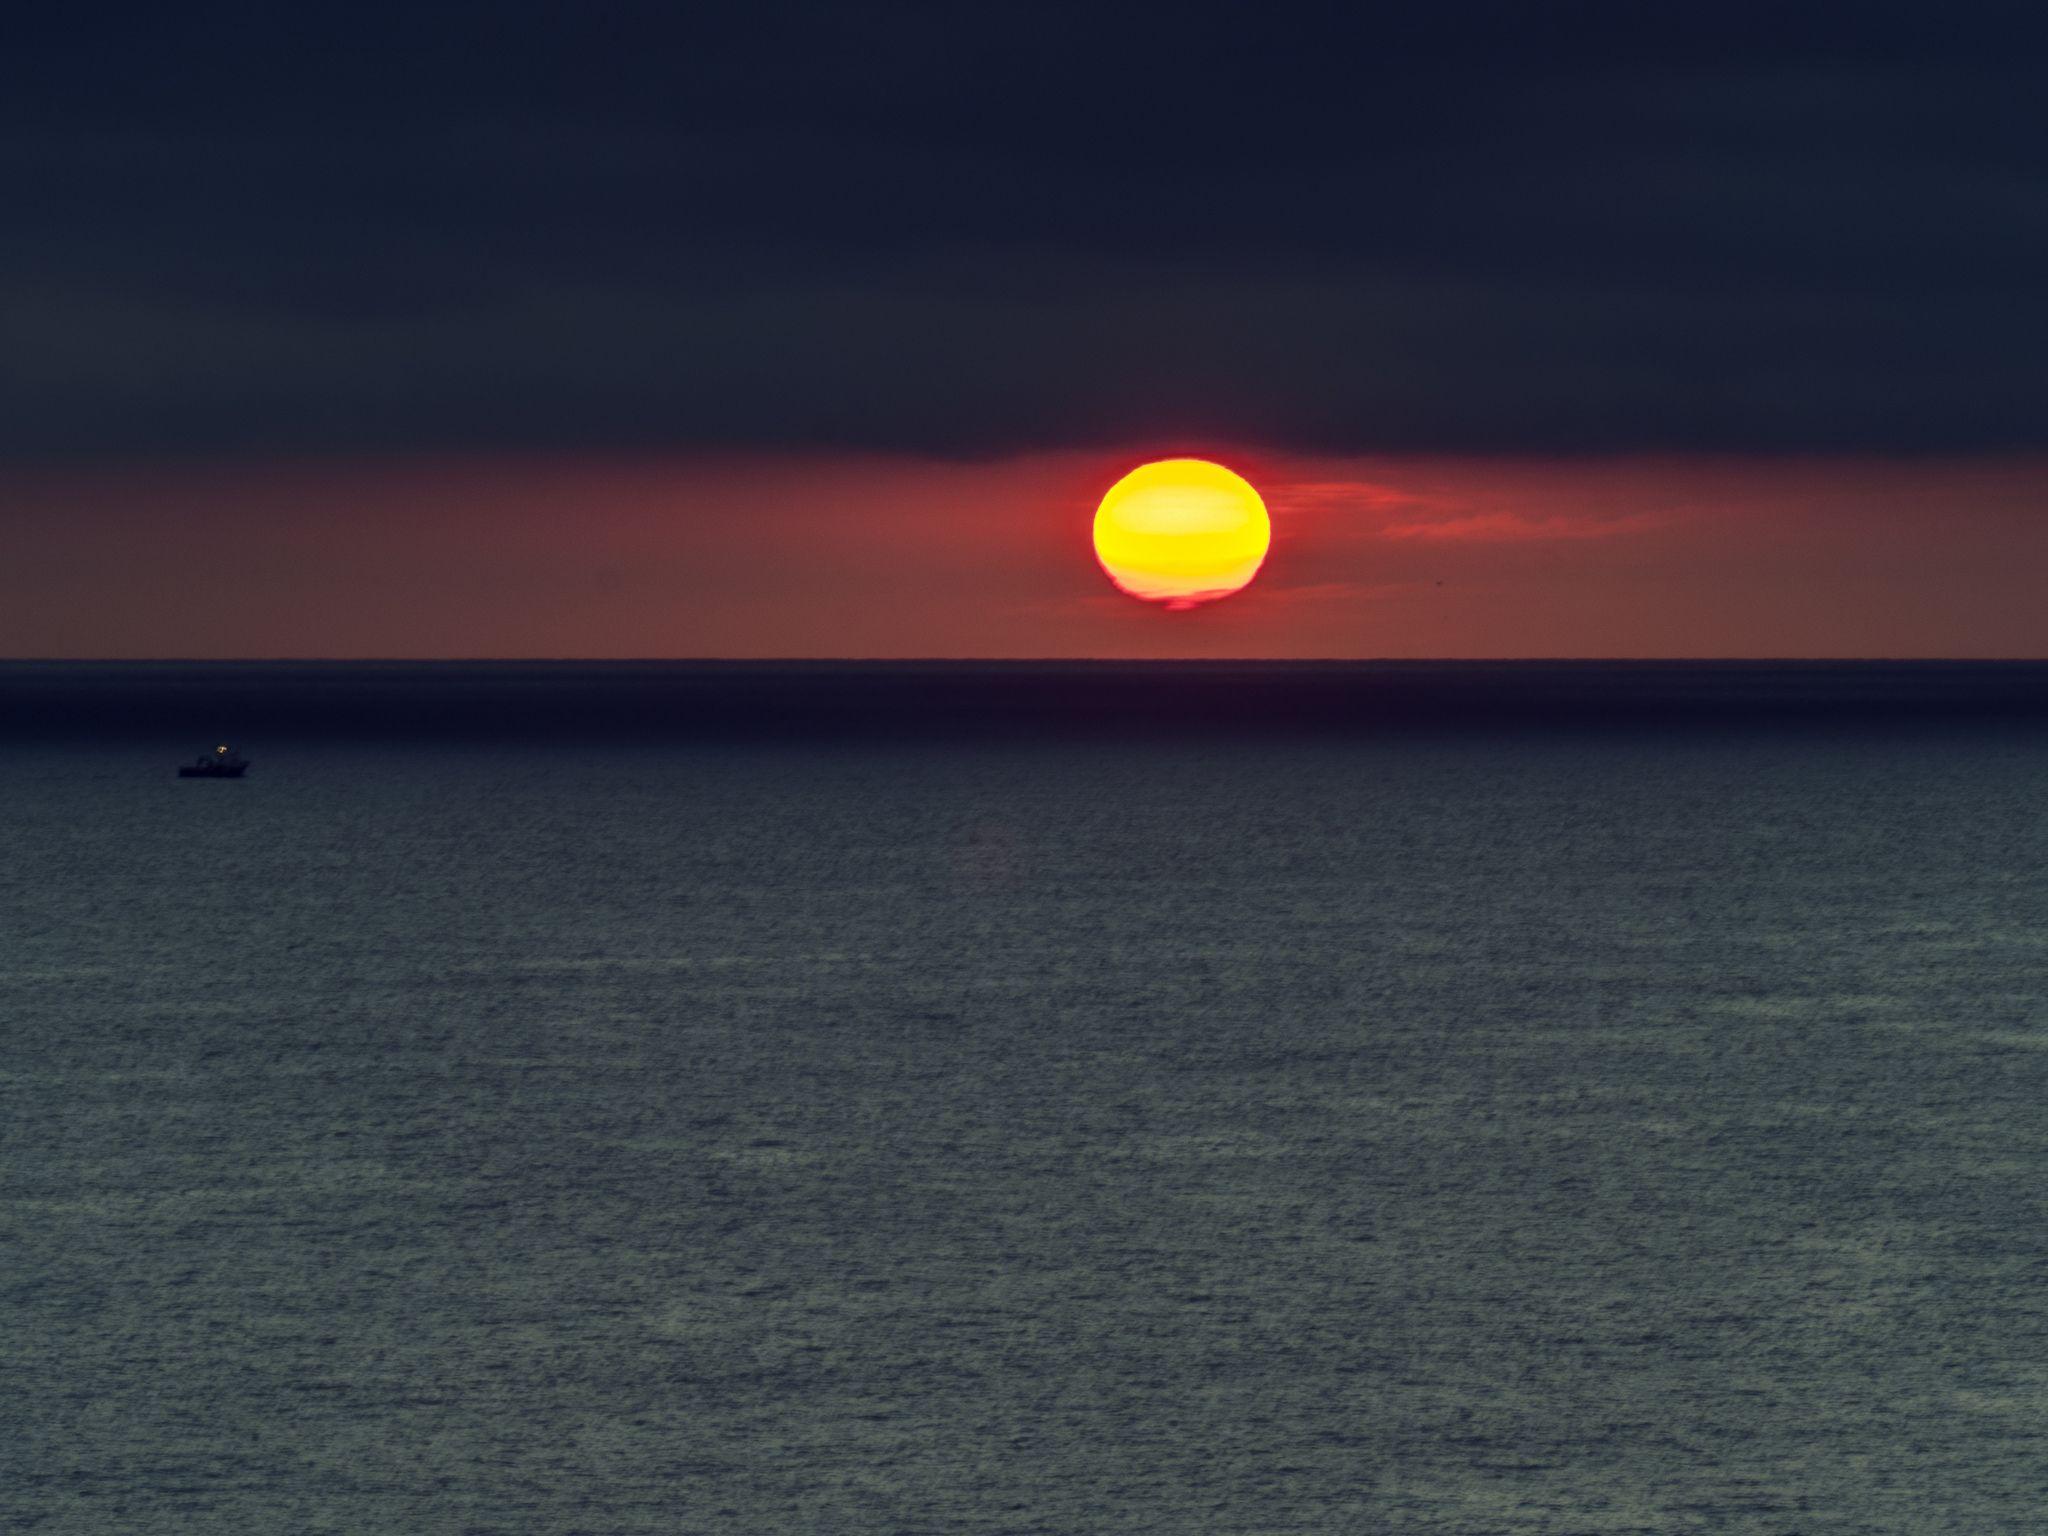 Amanecer Costa De Llanes Celestial Celestial Bodies Sunset